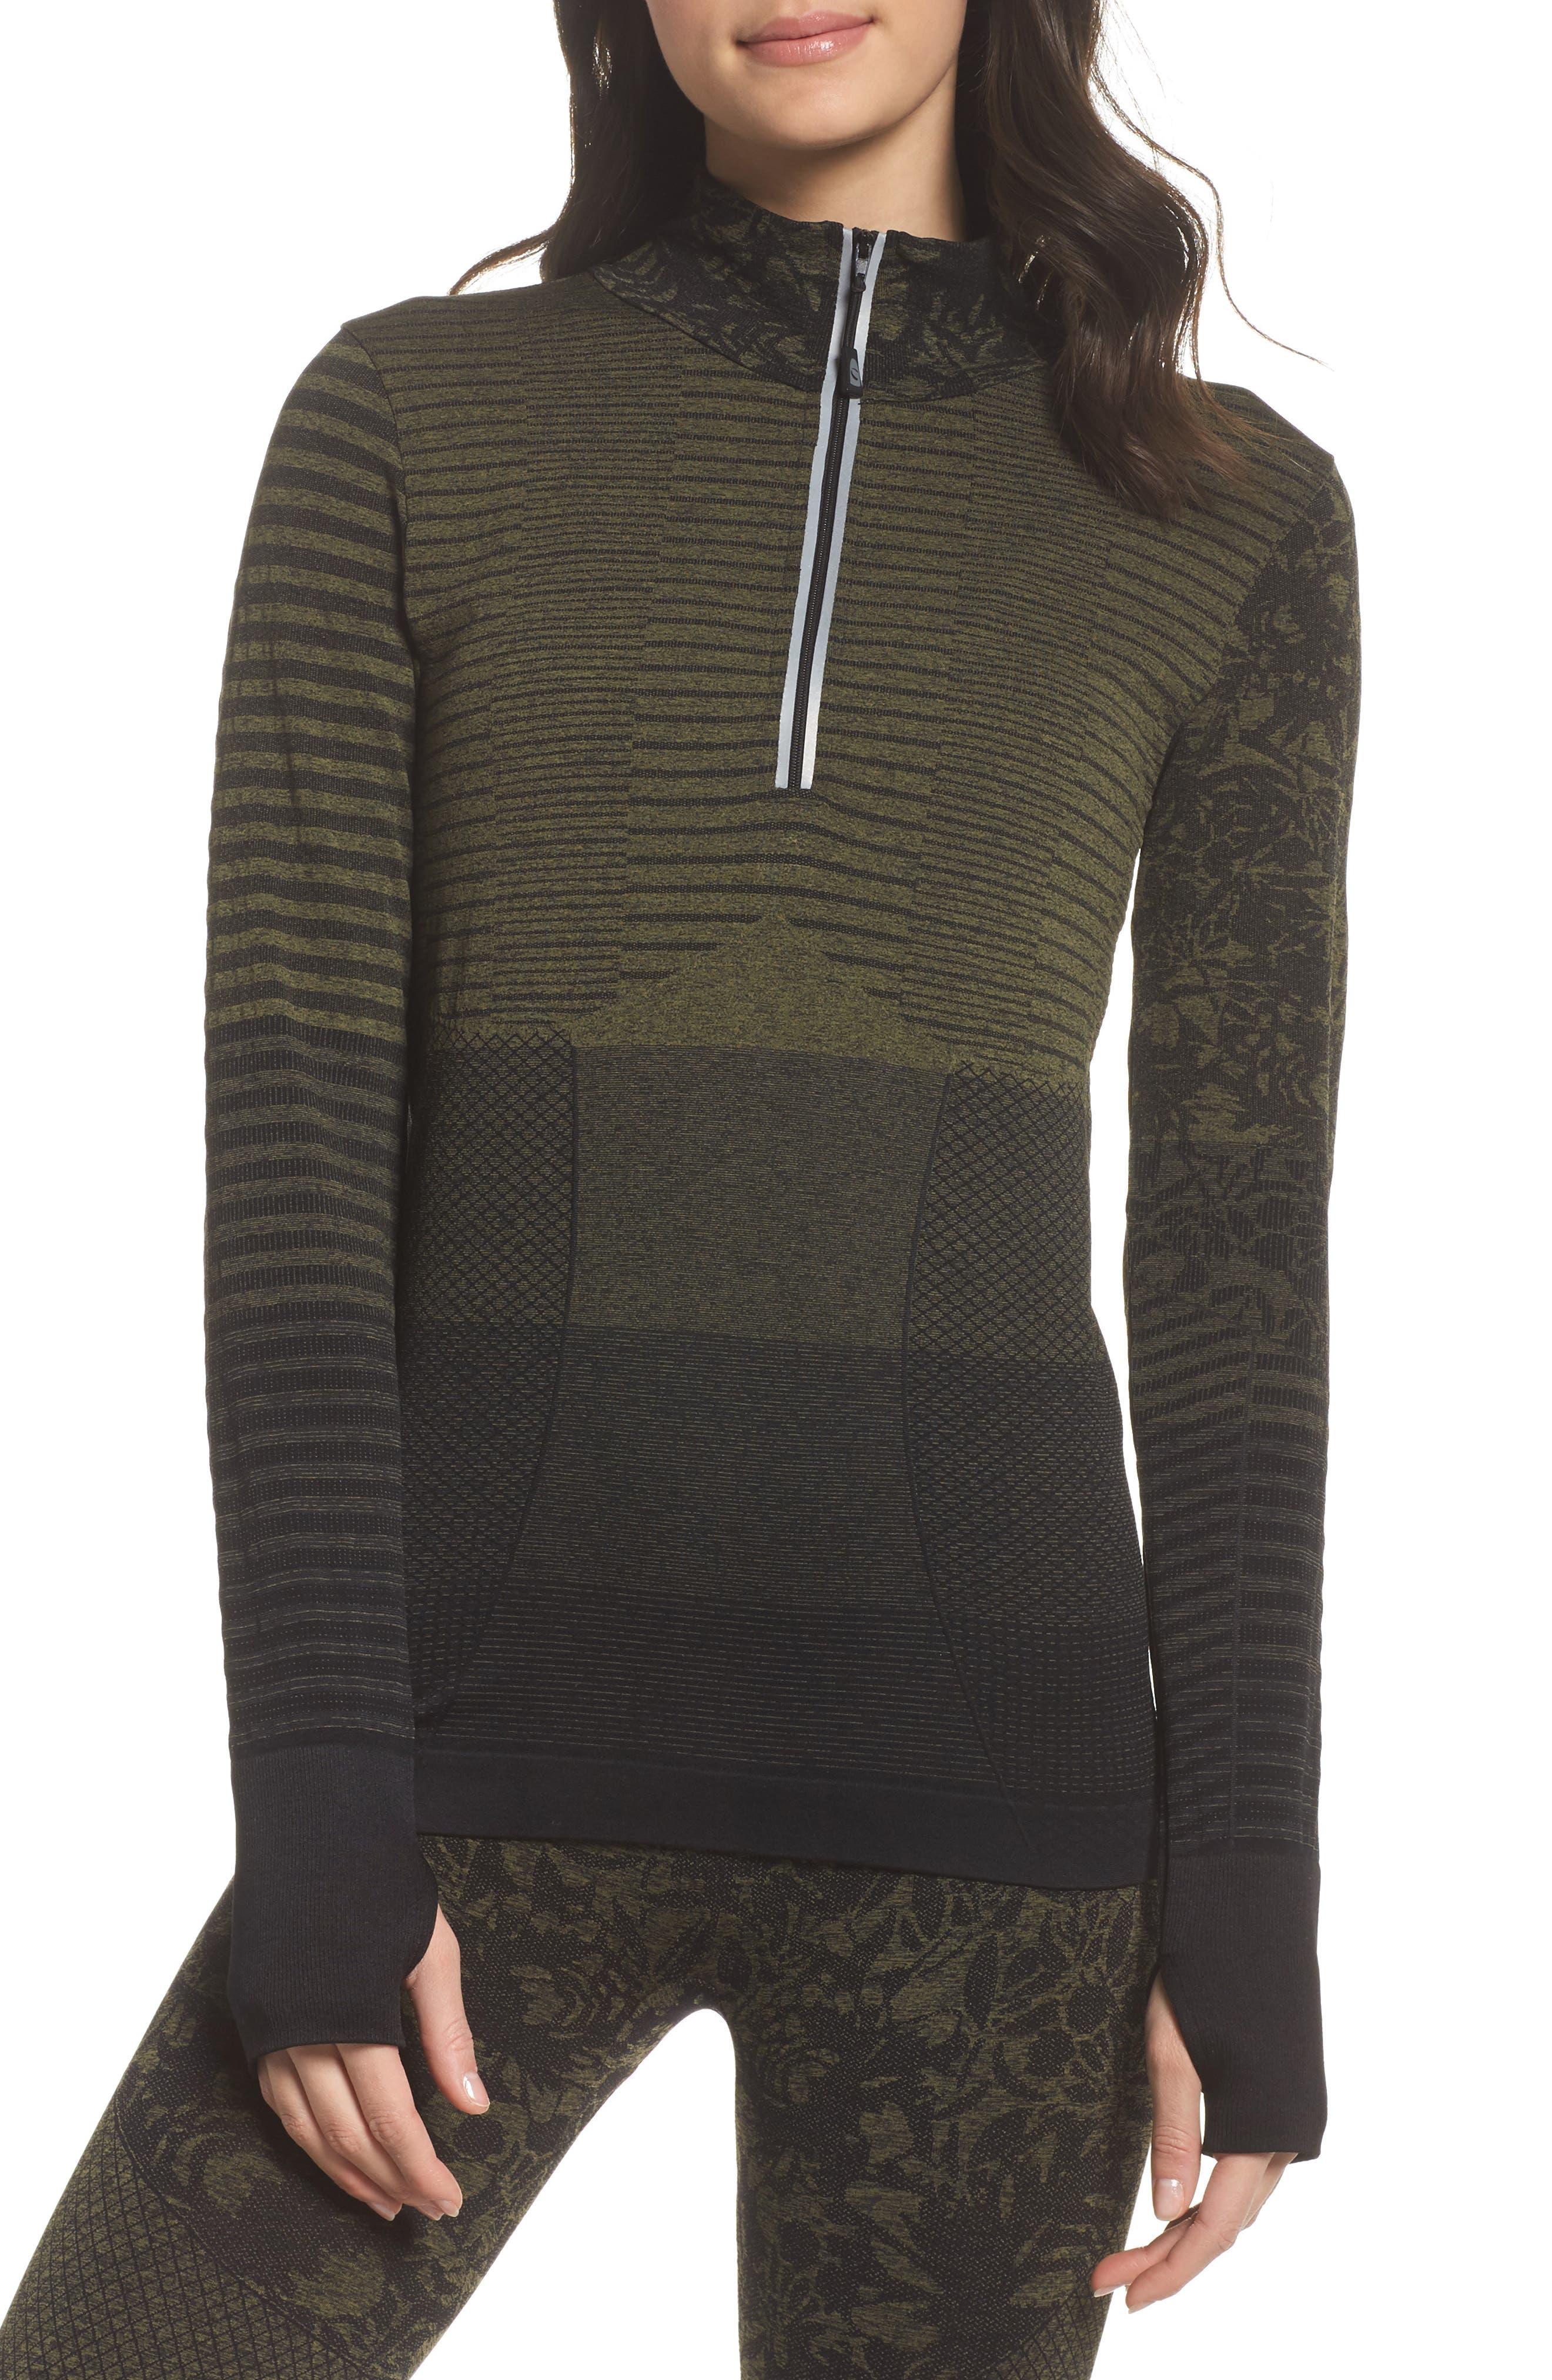 Vitality Quarter Zip Pullover,                             Main thumbnail 1, color,                             Deep Lichen Green/ Black